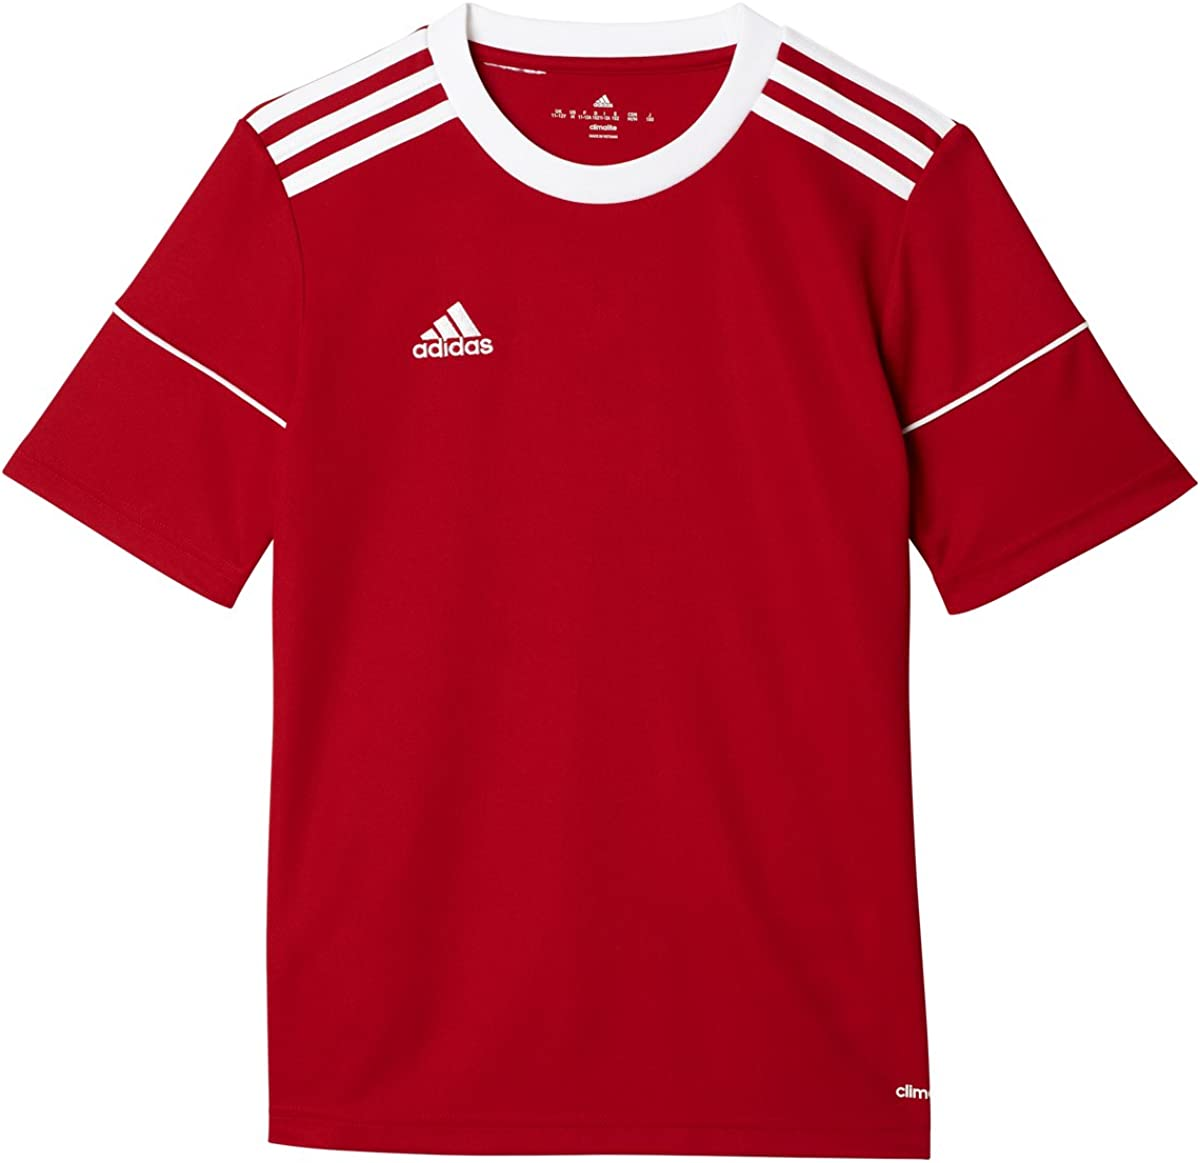 adidas Youth Squadra 17 Jersey